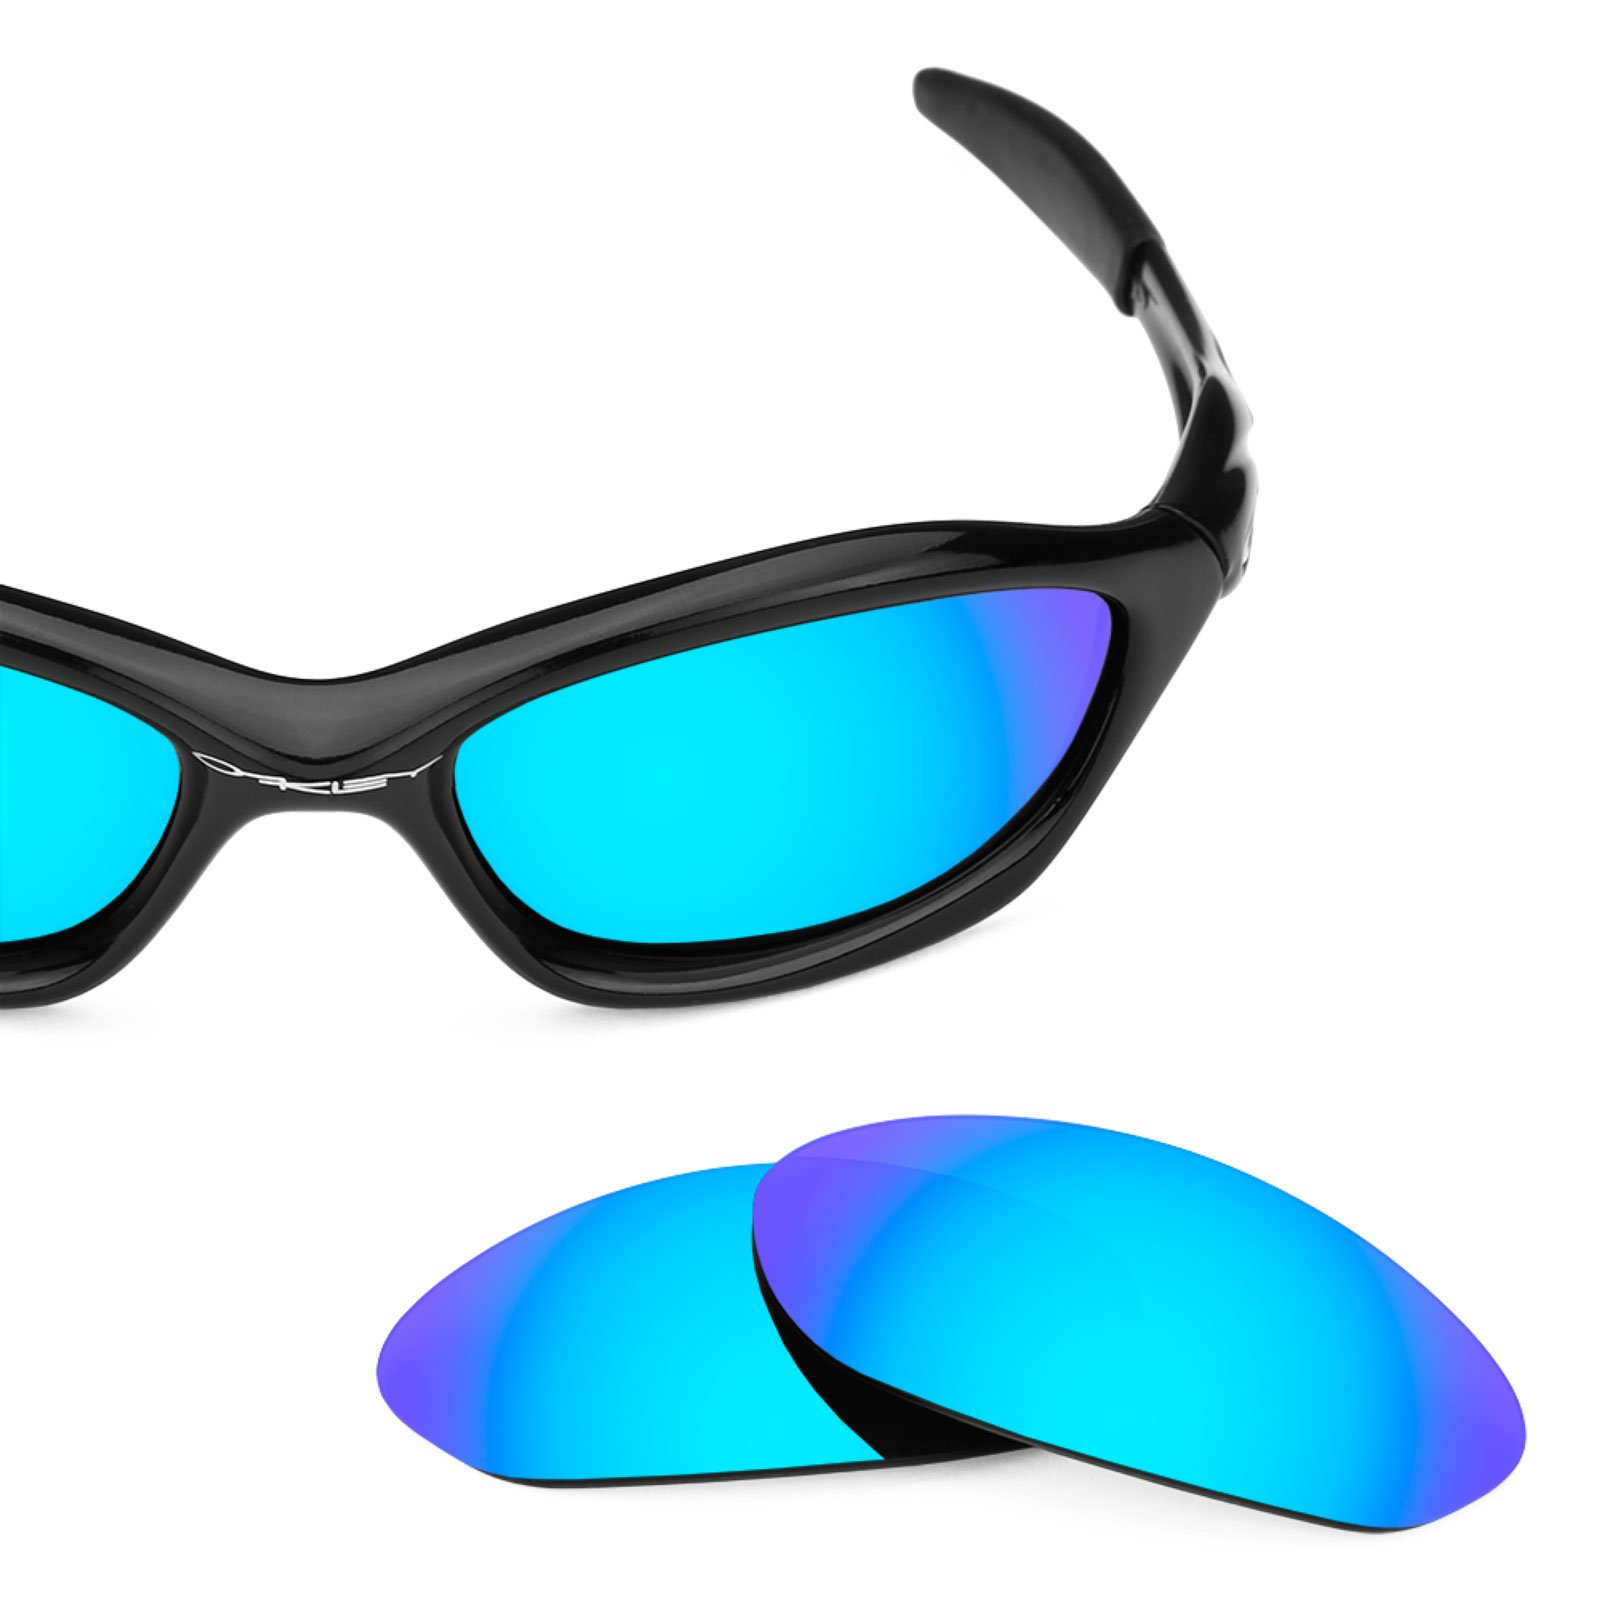 e163c130221 Revant Polarized Replacement Lenses for Oakley Unknown Elite Ice Blue  MirrorShield